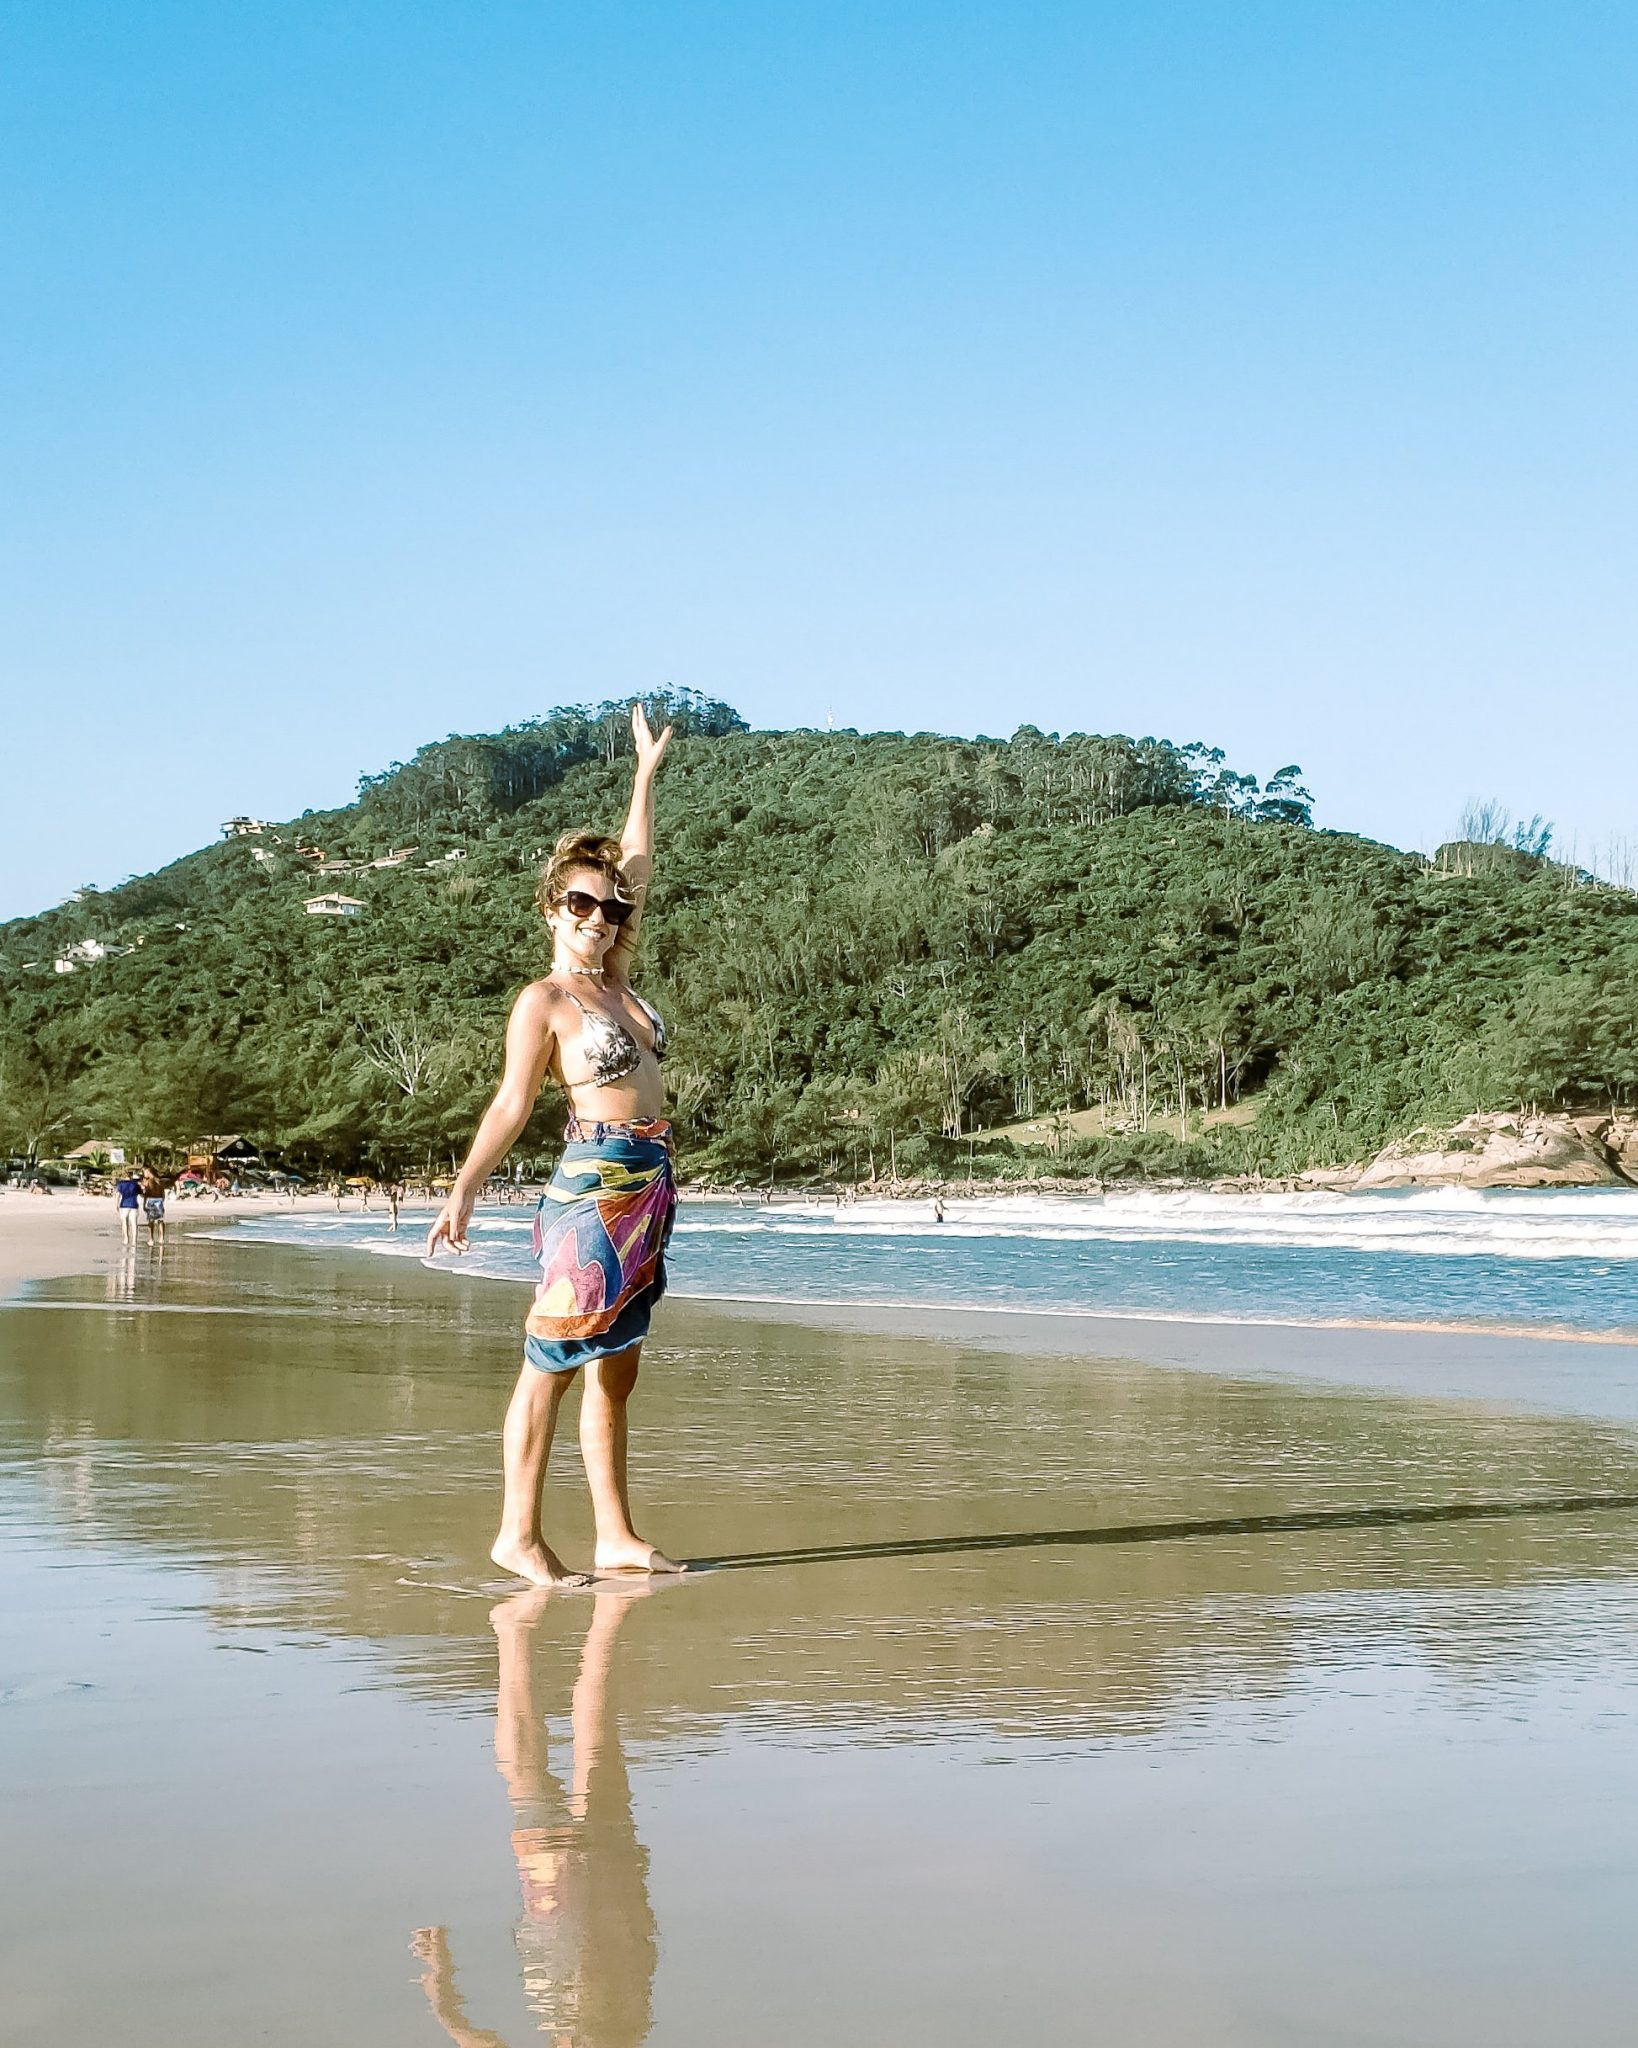 Melhores Praias de Santa Catarina / Praia da Ferrugem, Garopaba